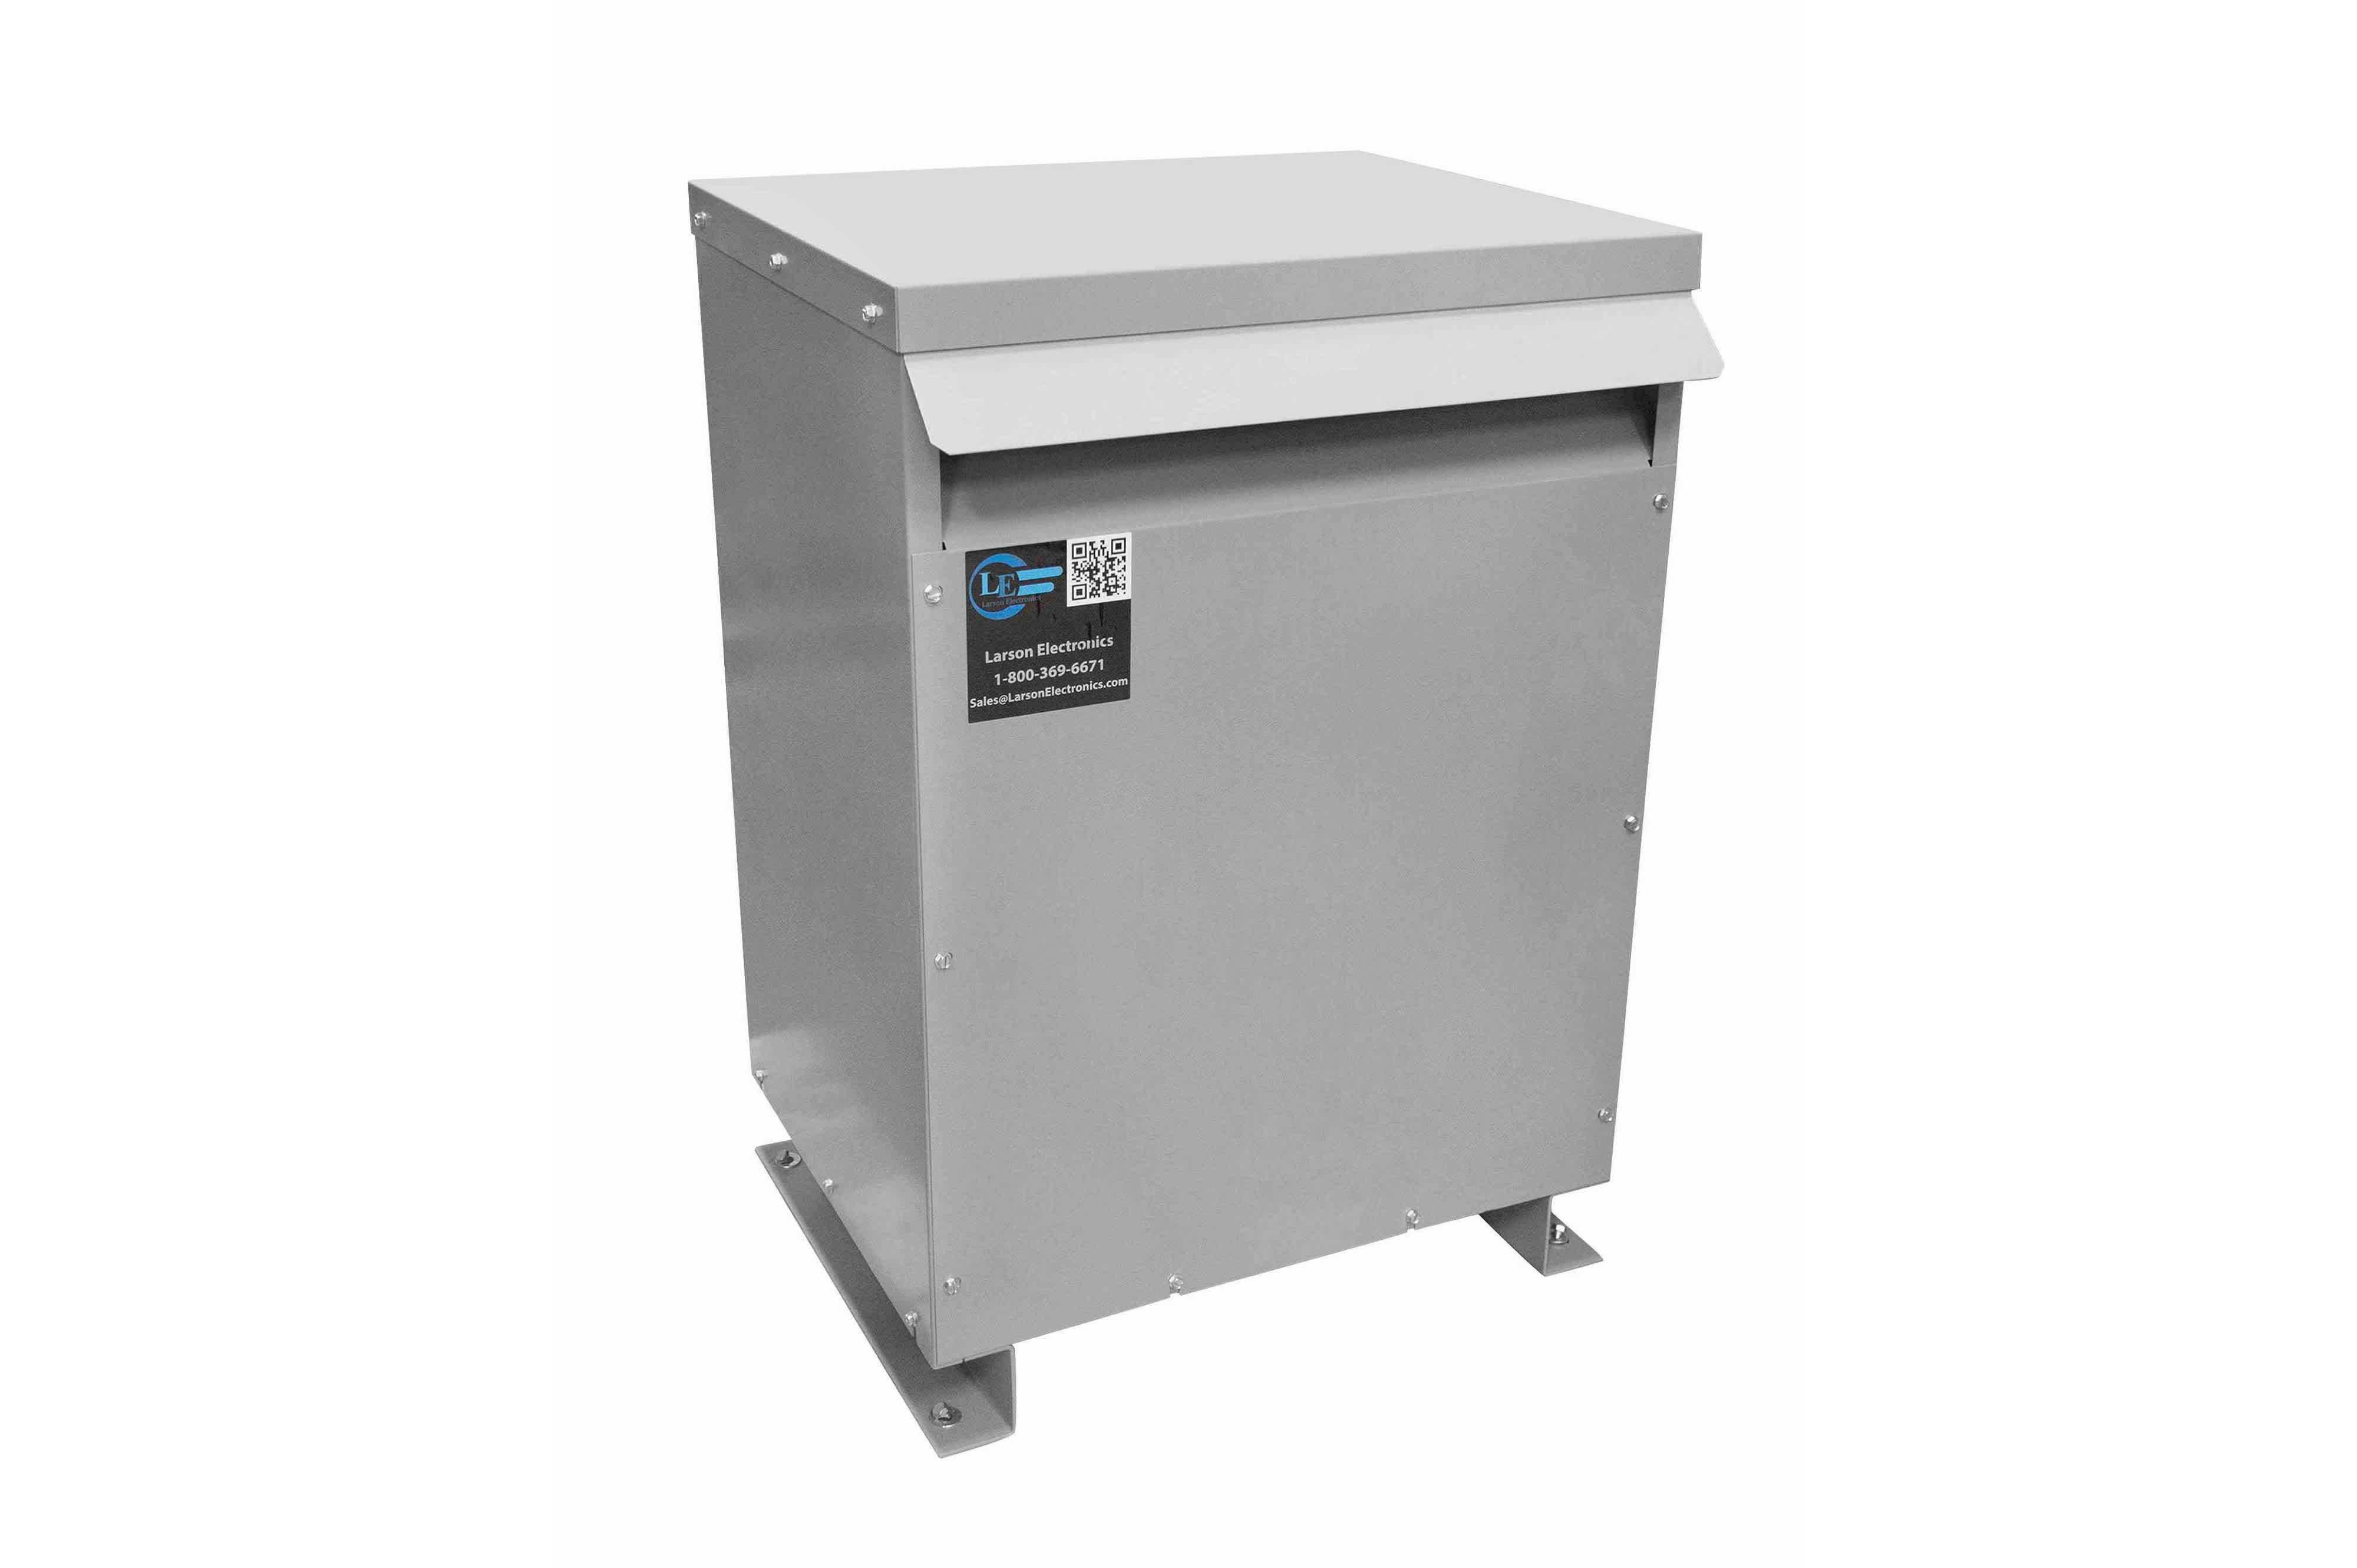 167 kVA 3PH Isolation Transformer, 460V Wye Primary, 415Y/240 Wye-N Secondary, N3R, Ventilated, 60 Hz